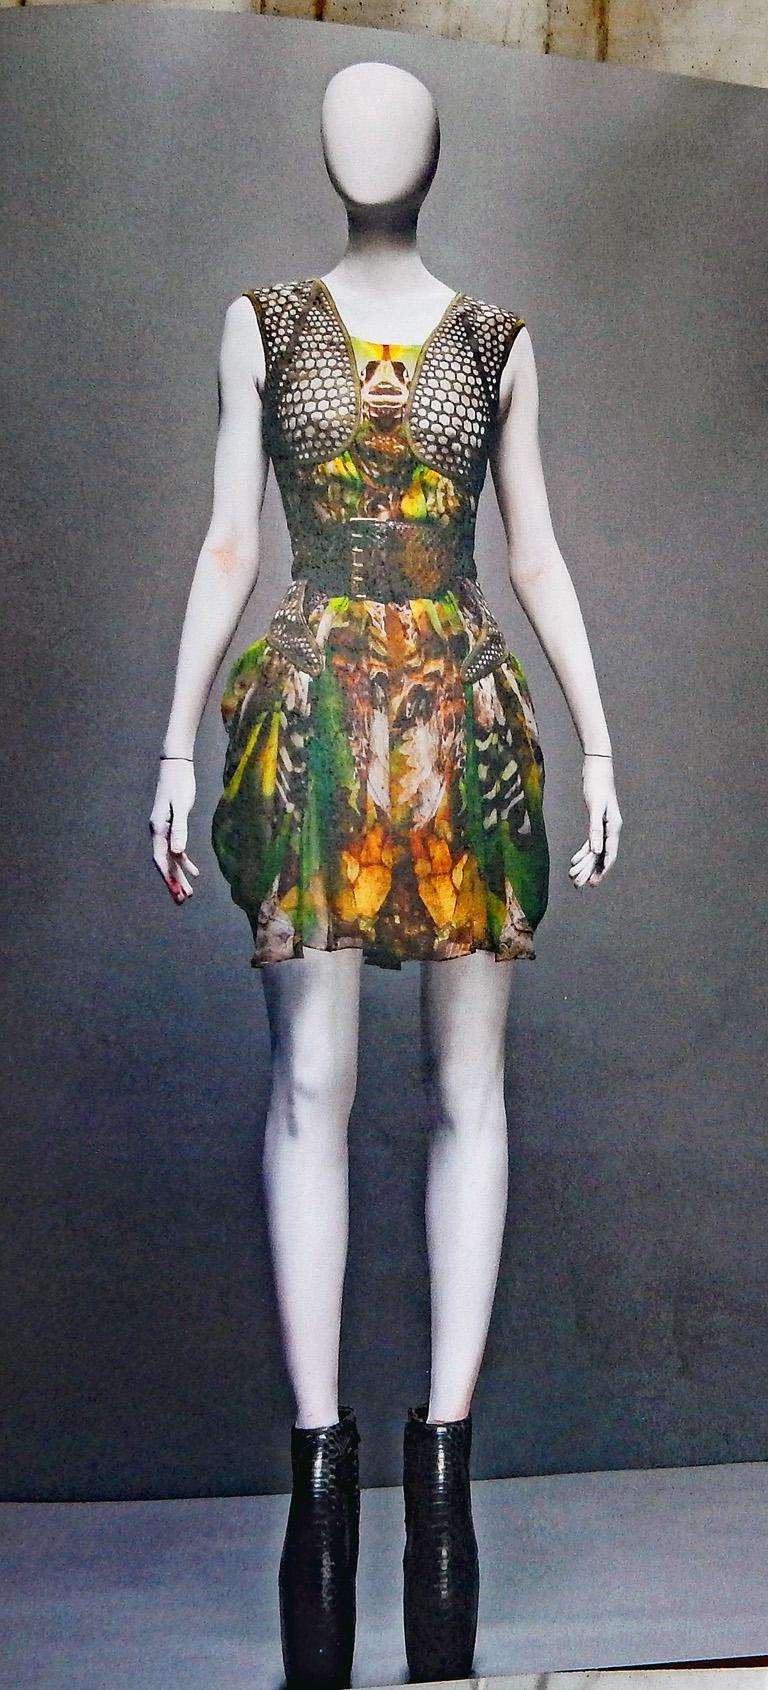 Rare! NWT Alexander McQueen 'Moth' dress, Plato's Atlantis 2010 For Sale 7